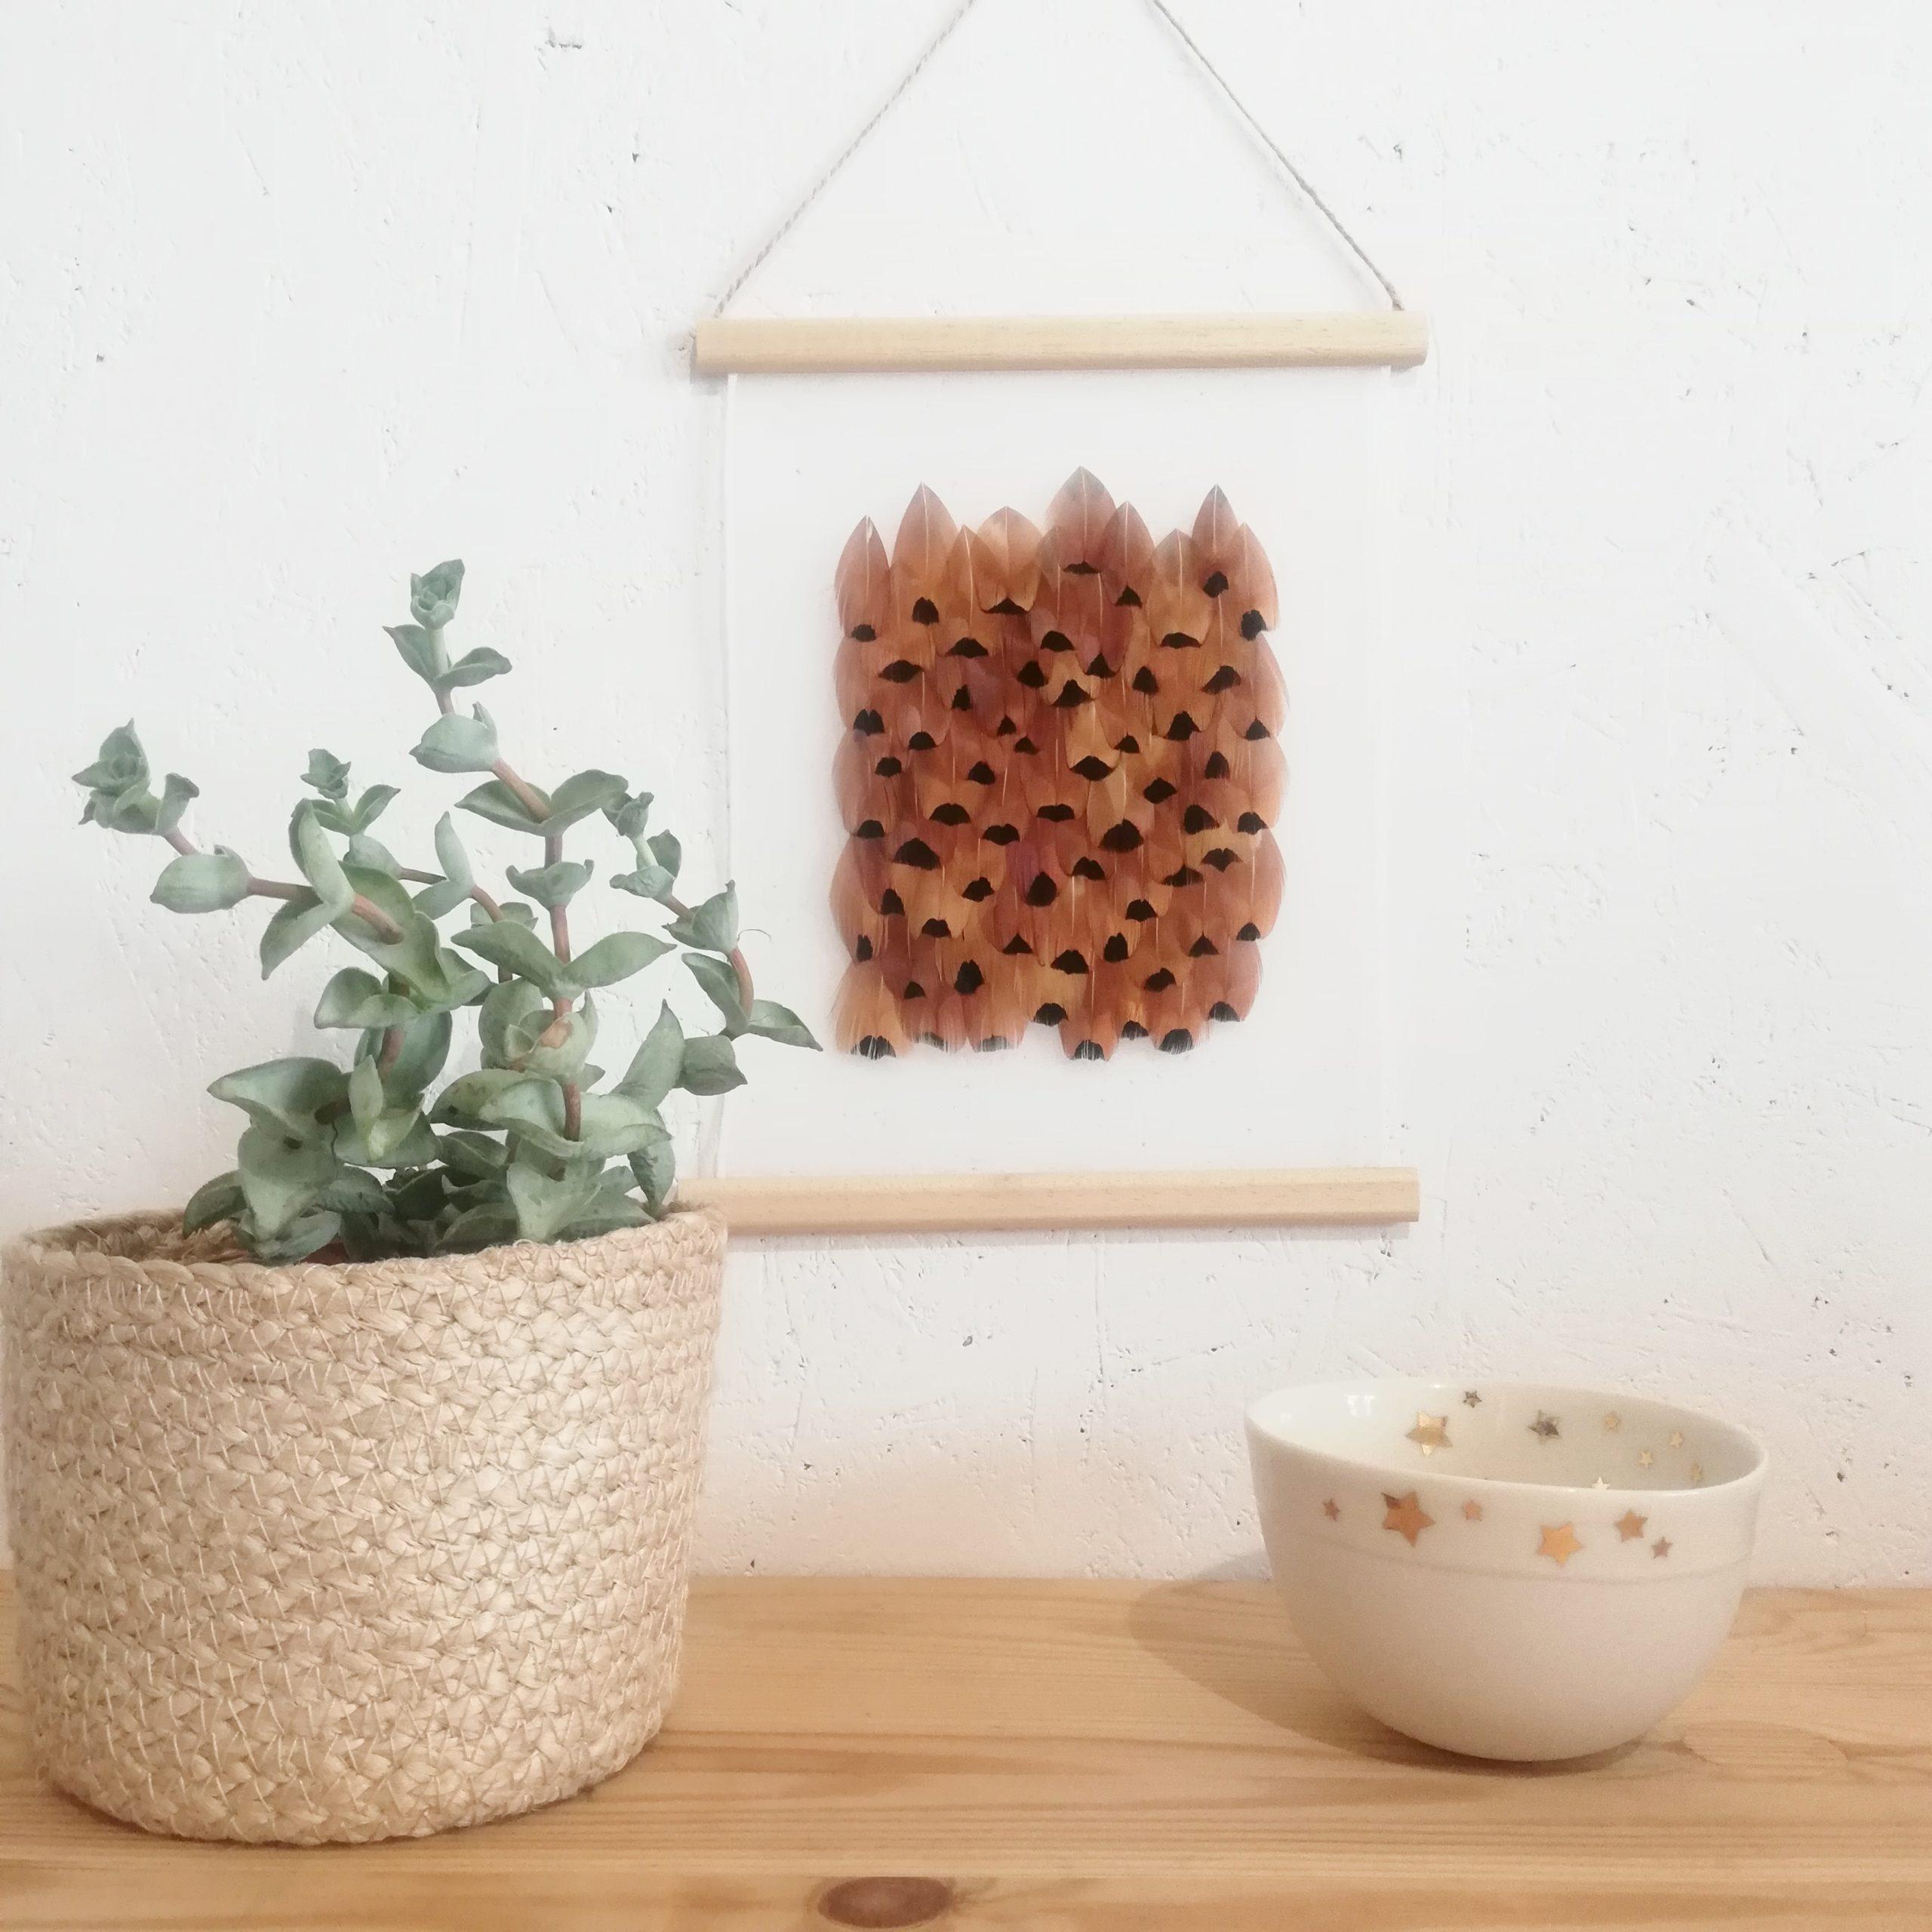 Kakémono carré de faisan de Colchide